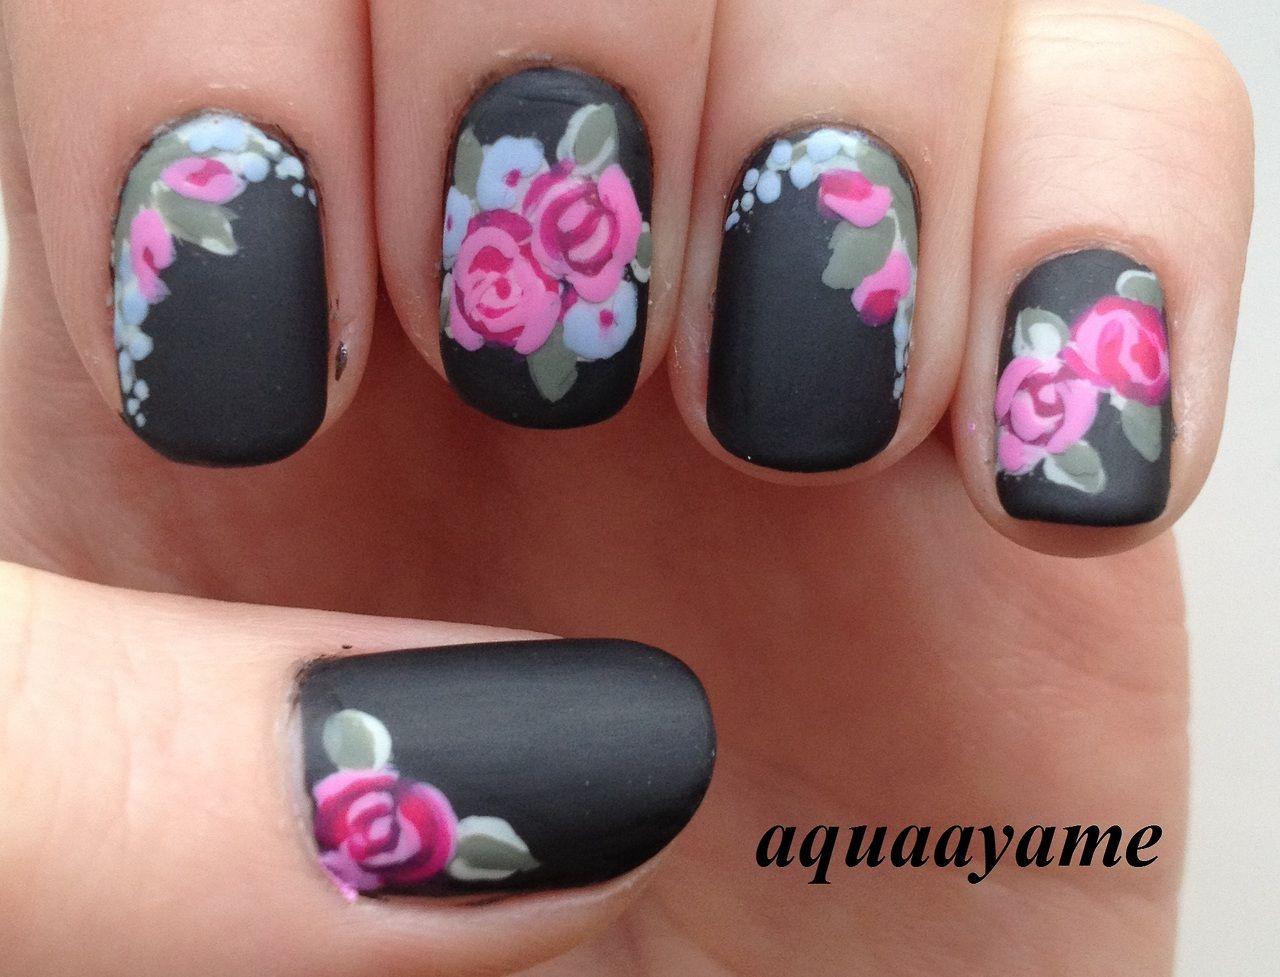 Floral 'n Black matte nail art. I'm not really into nails but - Floral 'n Black Matte Nail Art. I'm Not Really Into Nails But This